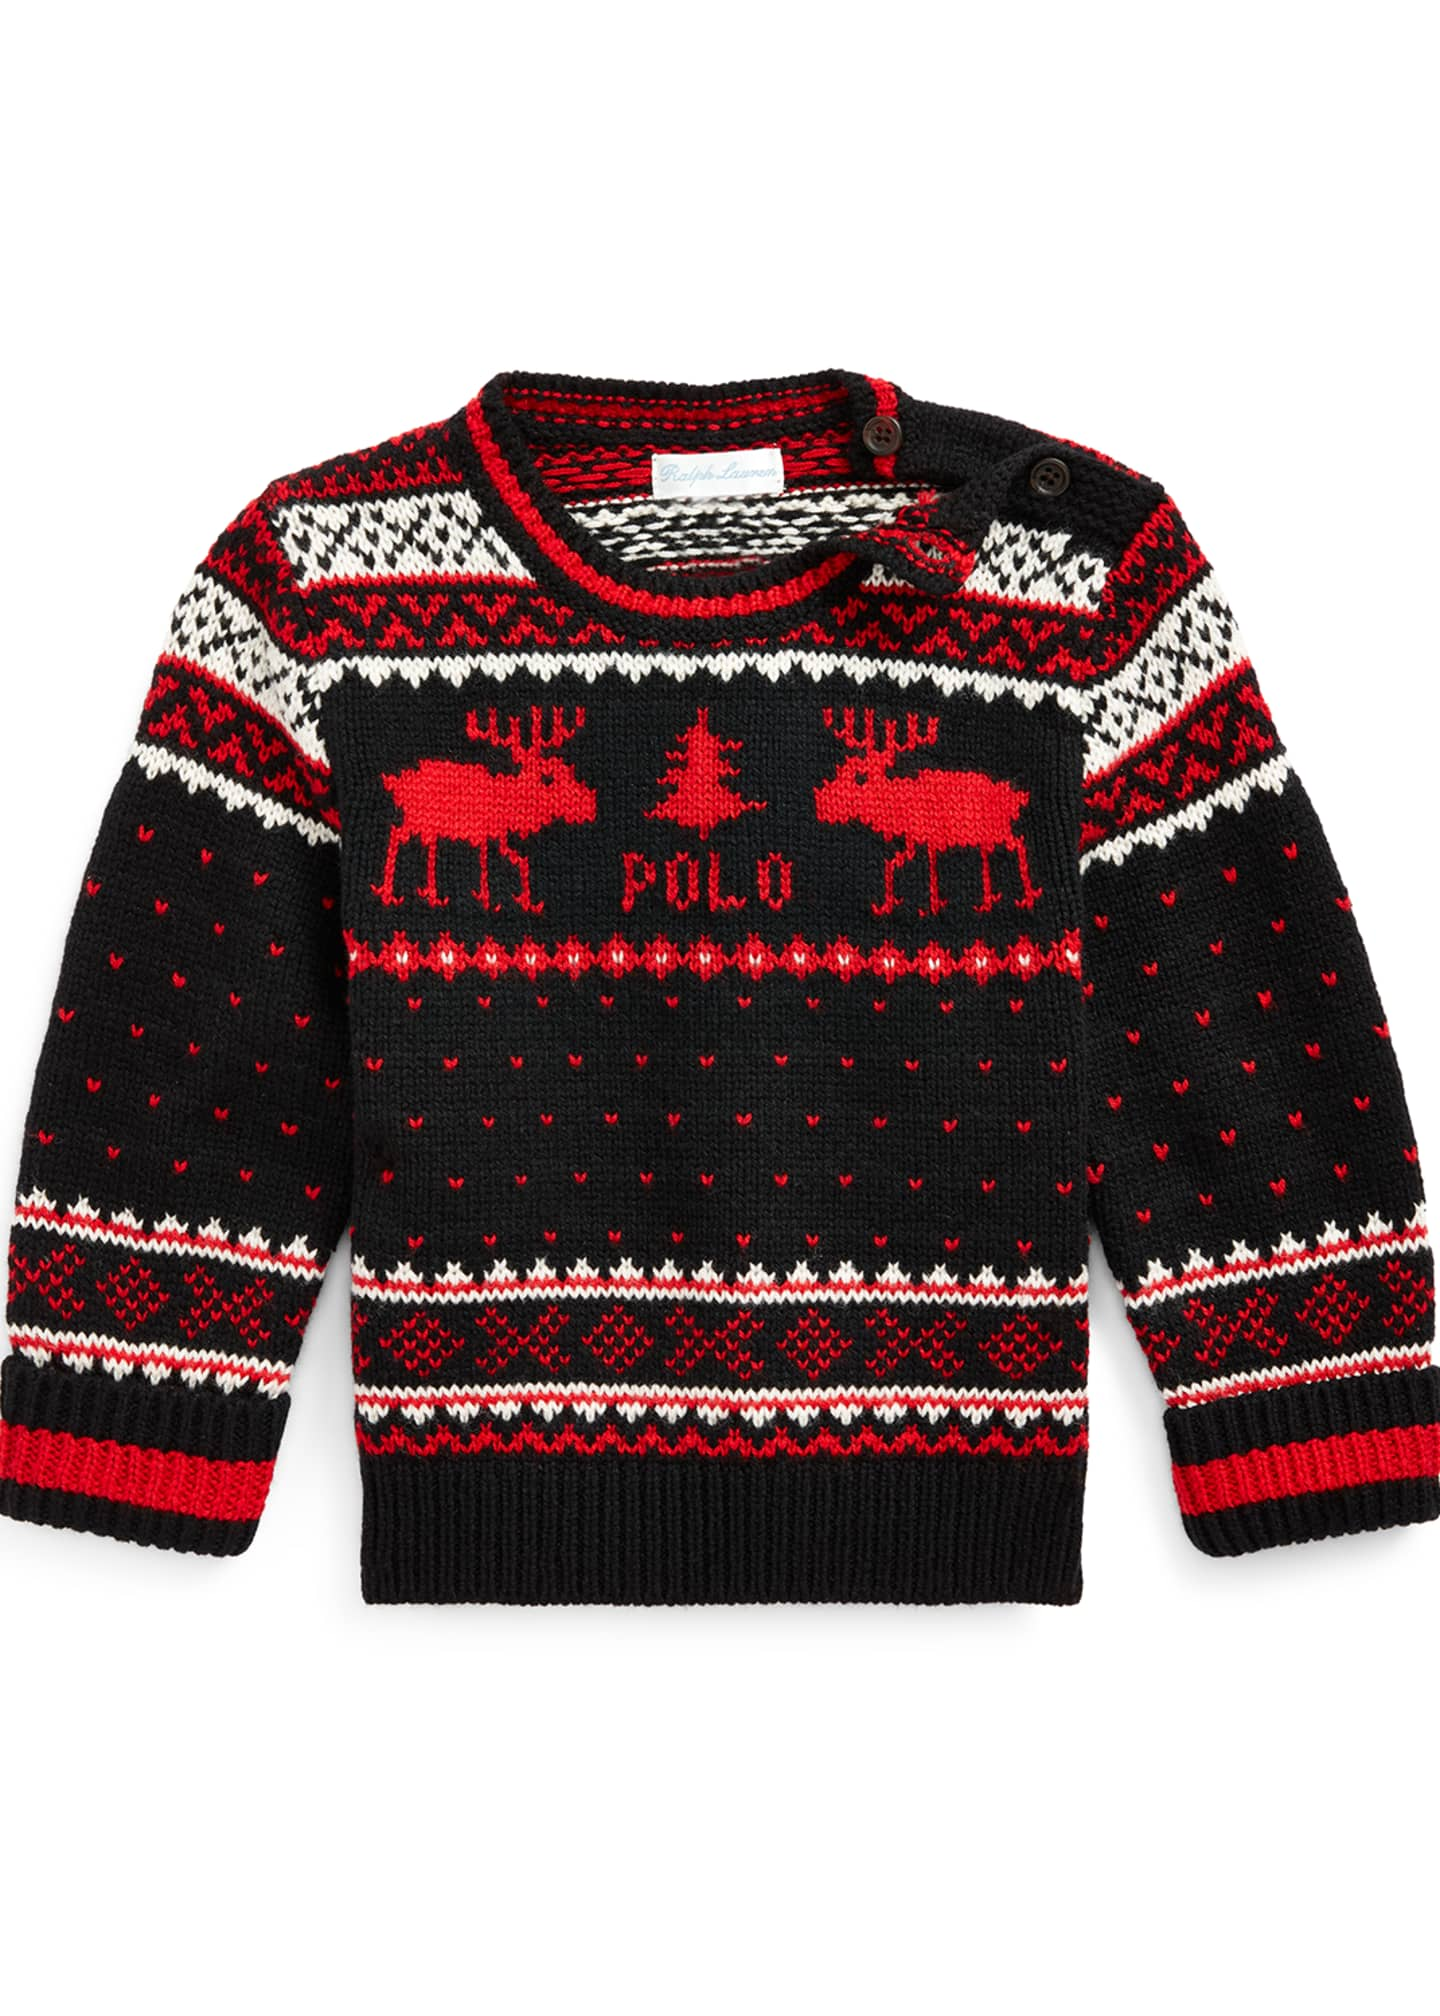 Ralph Lauren Childrenswear Boy's Reindeer Fair Isle Knit